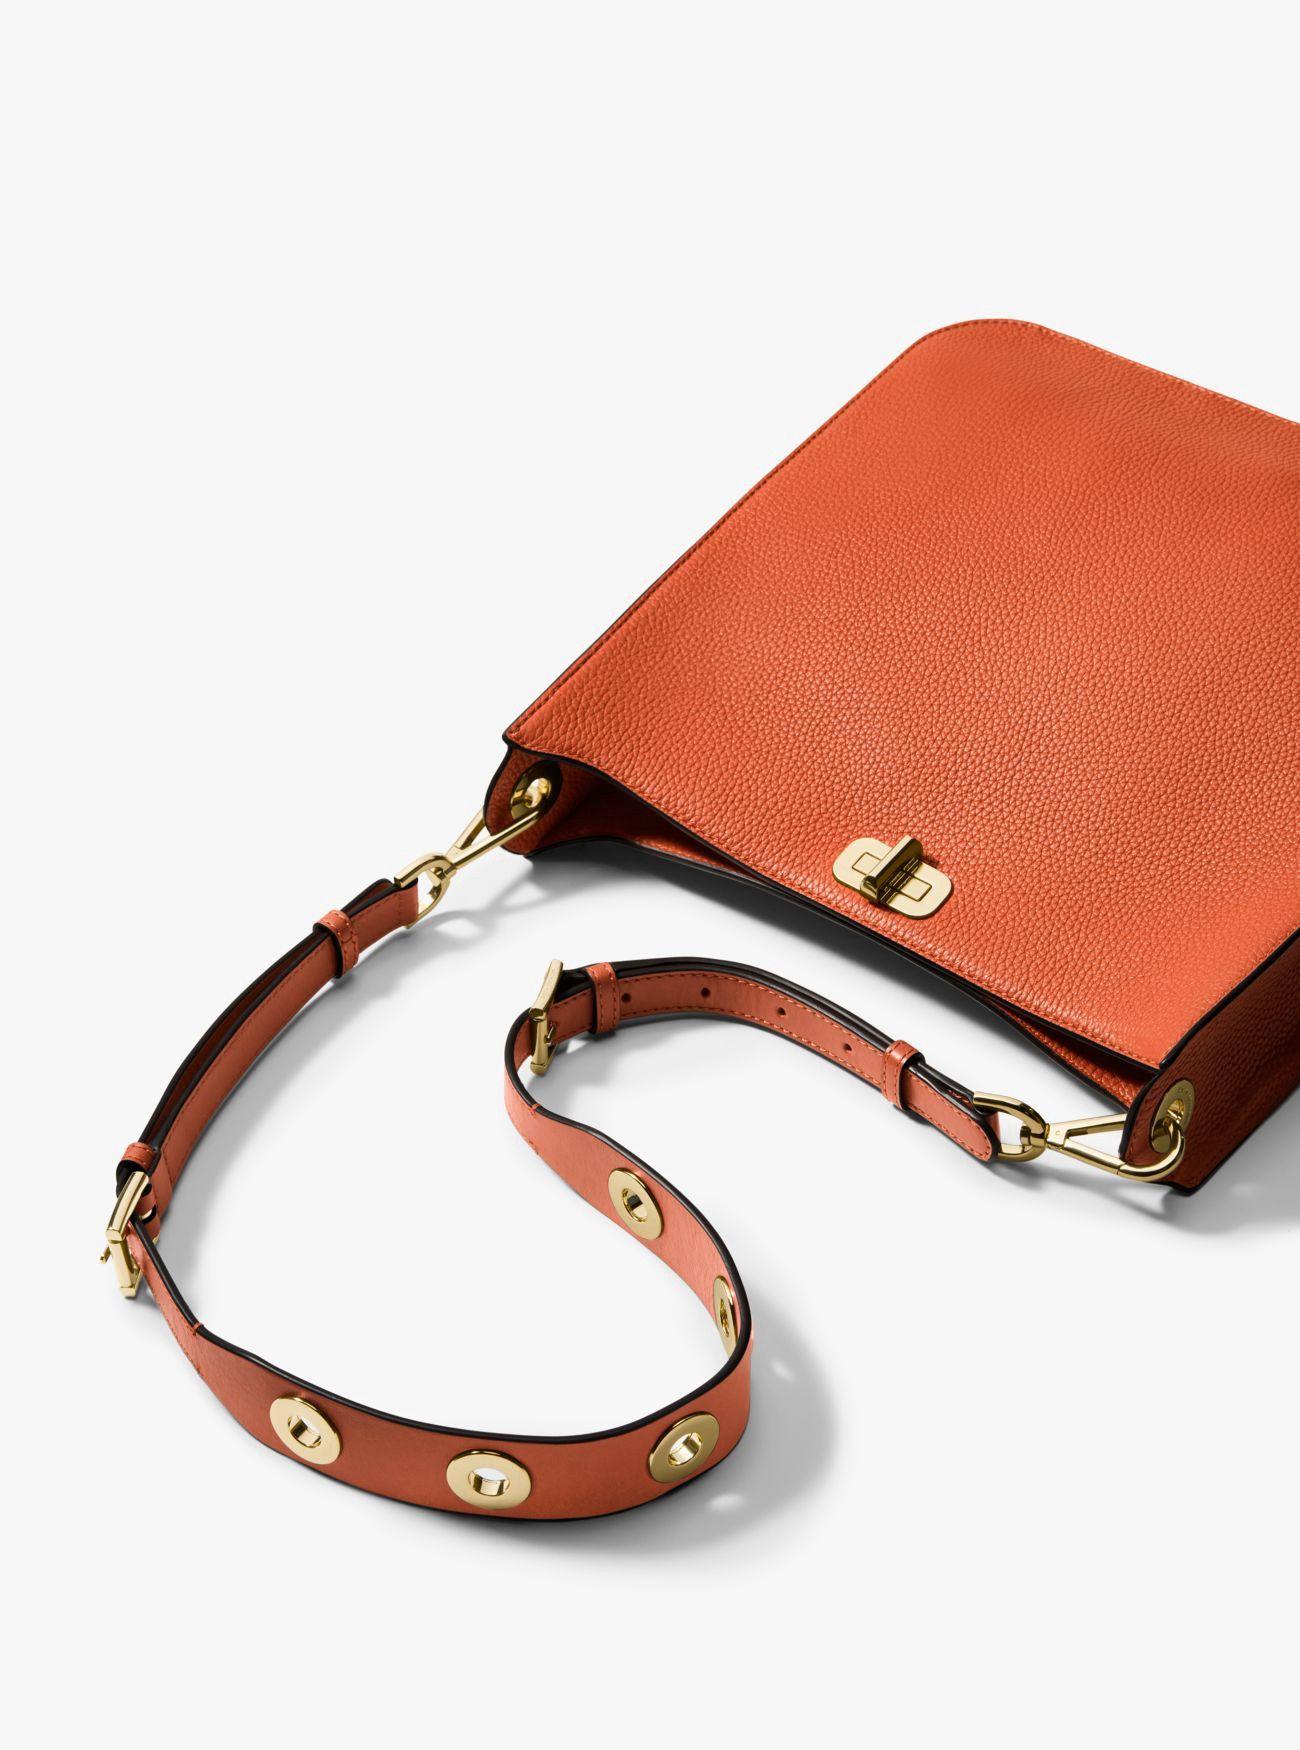 e182379e9d67 MICHAEL KORS Sullivan Large Leather Messenger.  michaelkors  bags  shoulder  bags  leather  polyester  lining